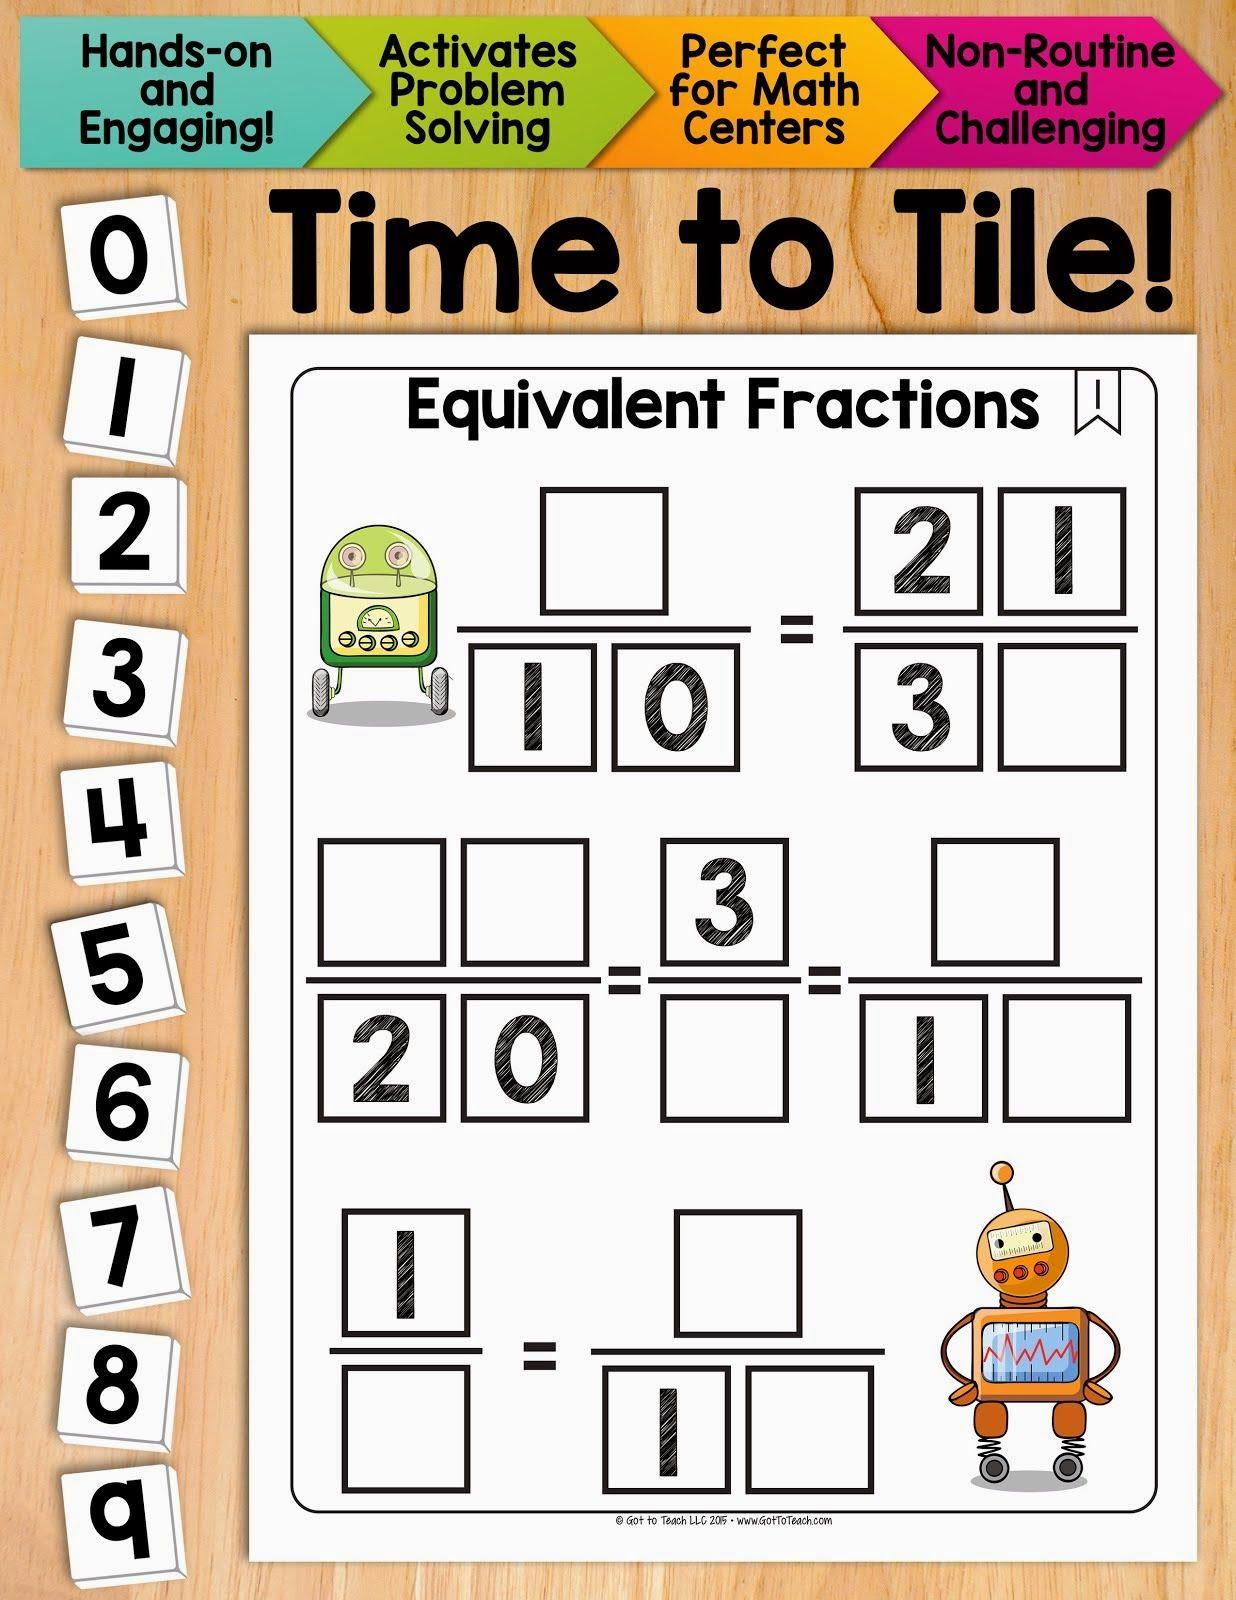 Math Tiles My Favorite Math Activity